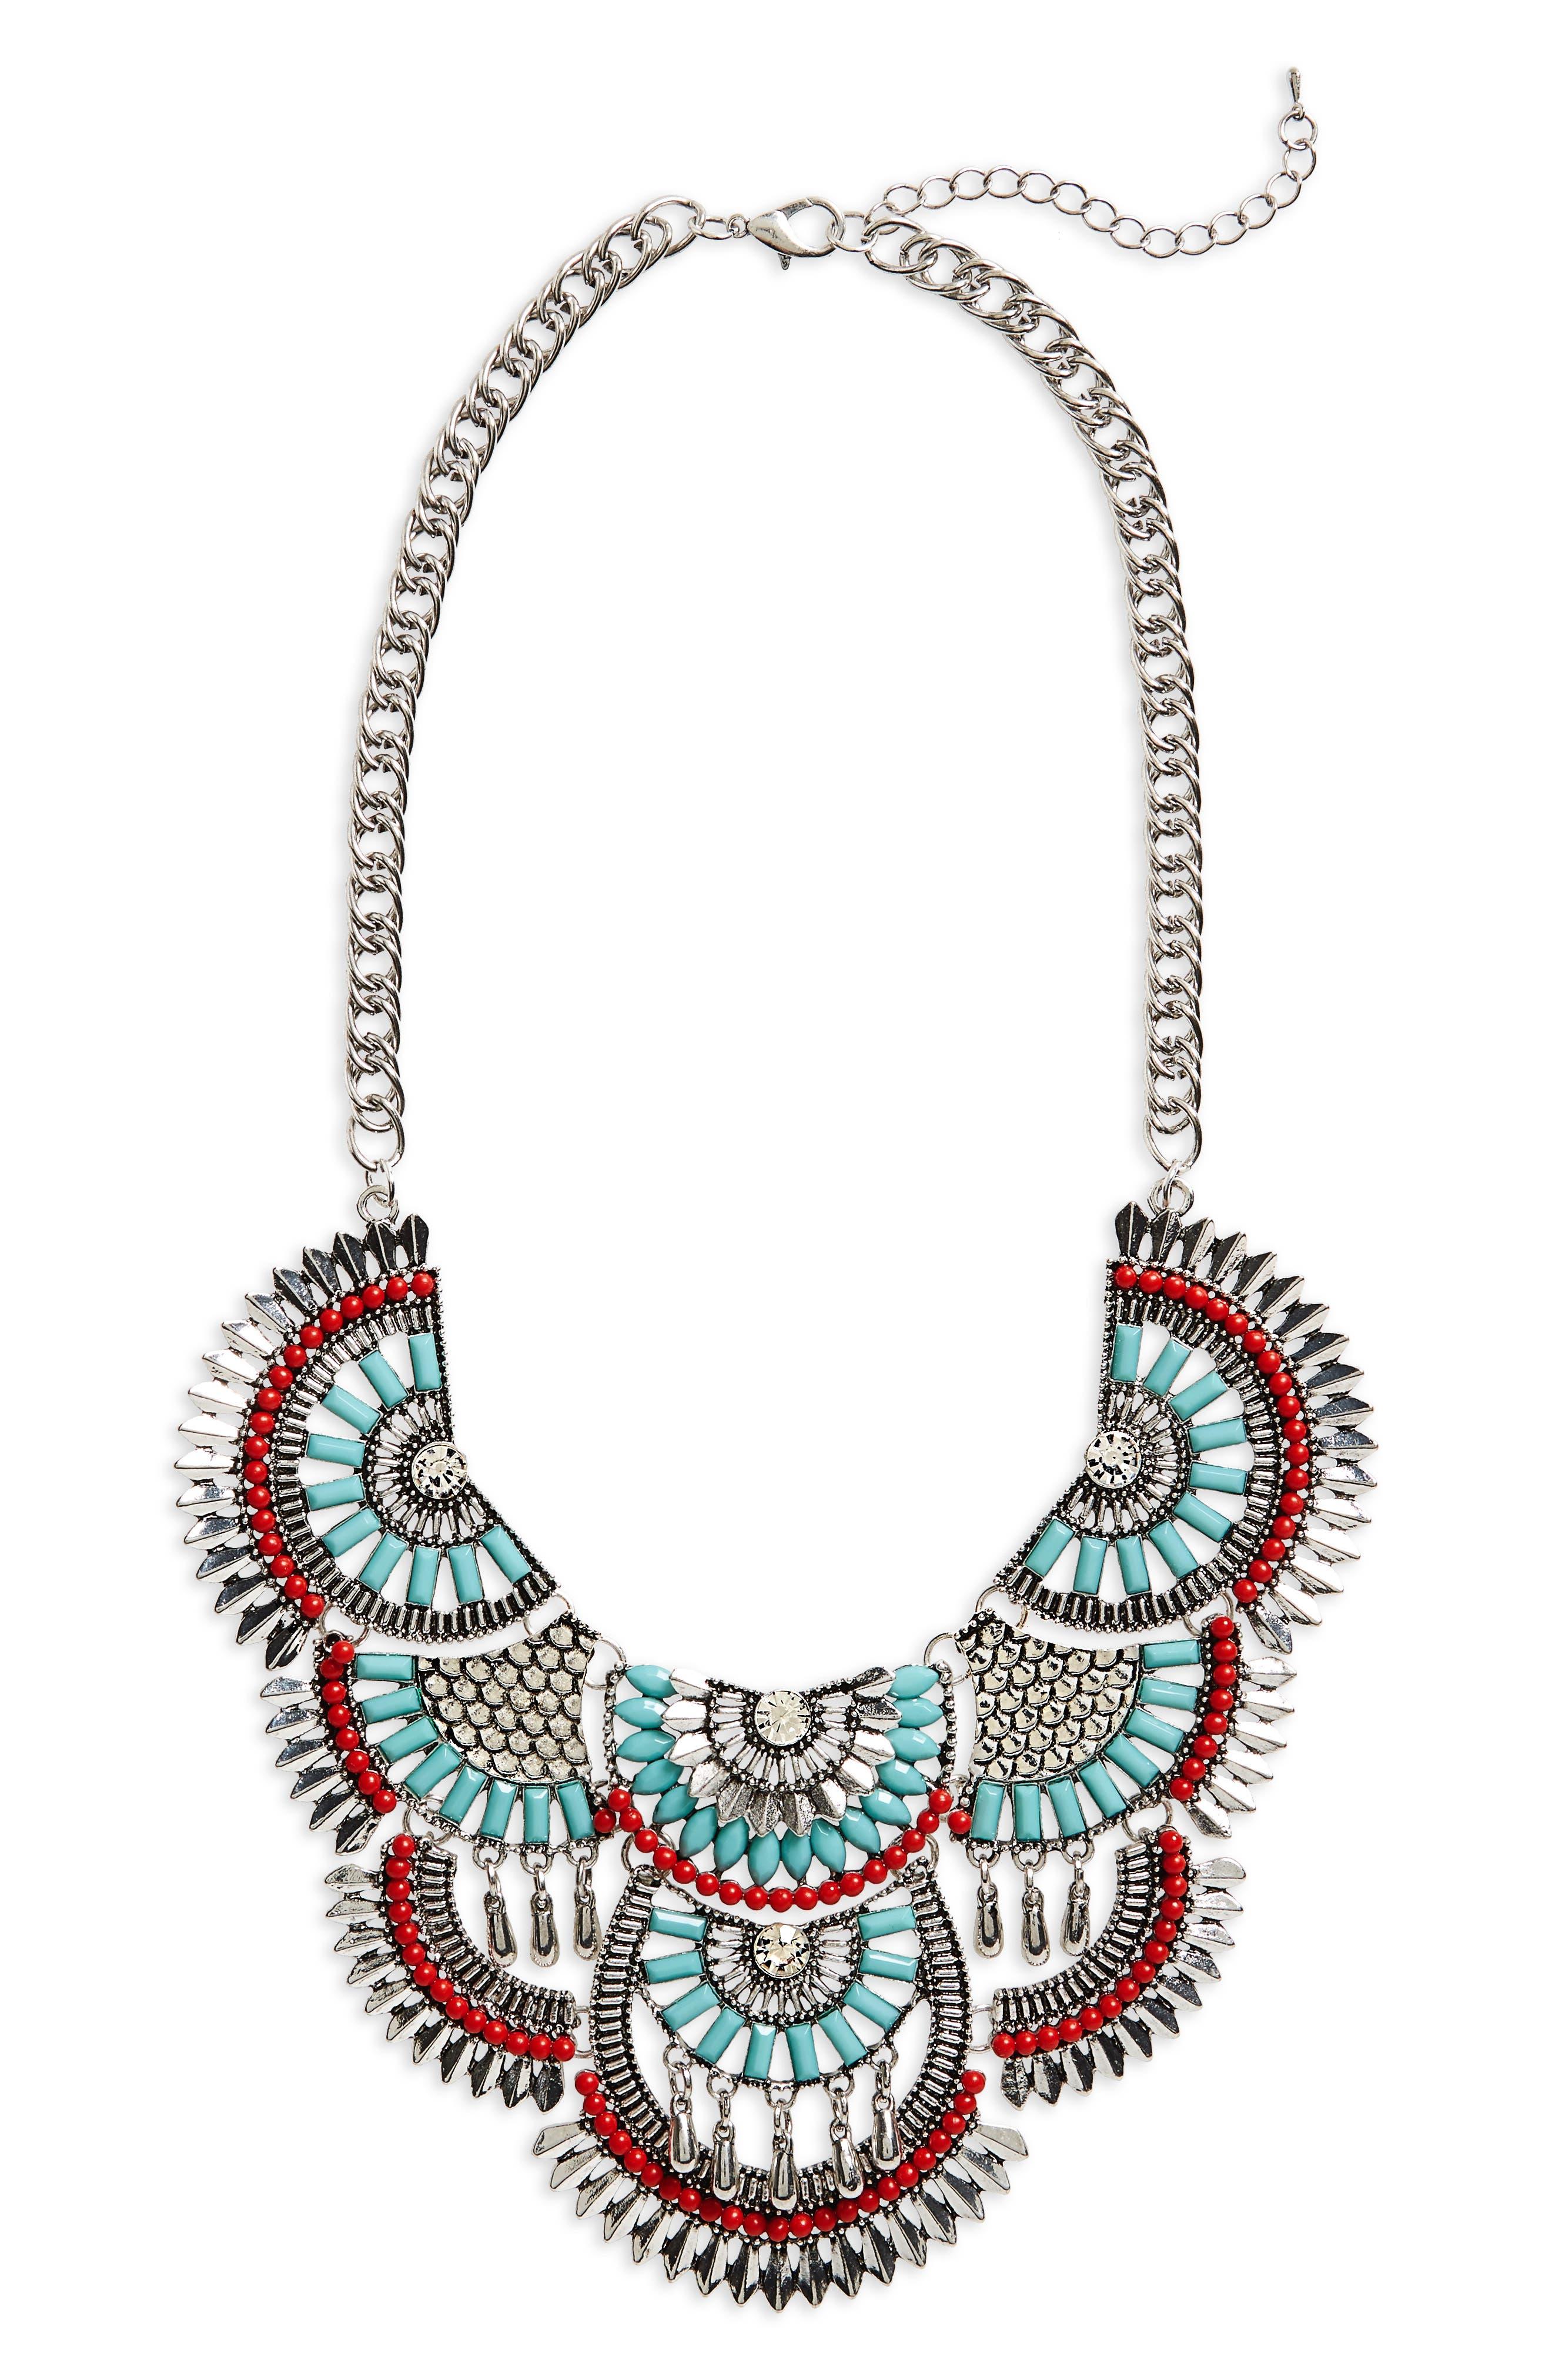 Cara Crystal Chain Bib Necklace